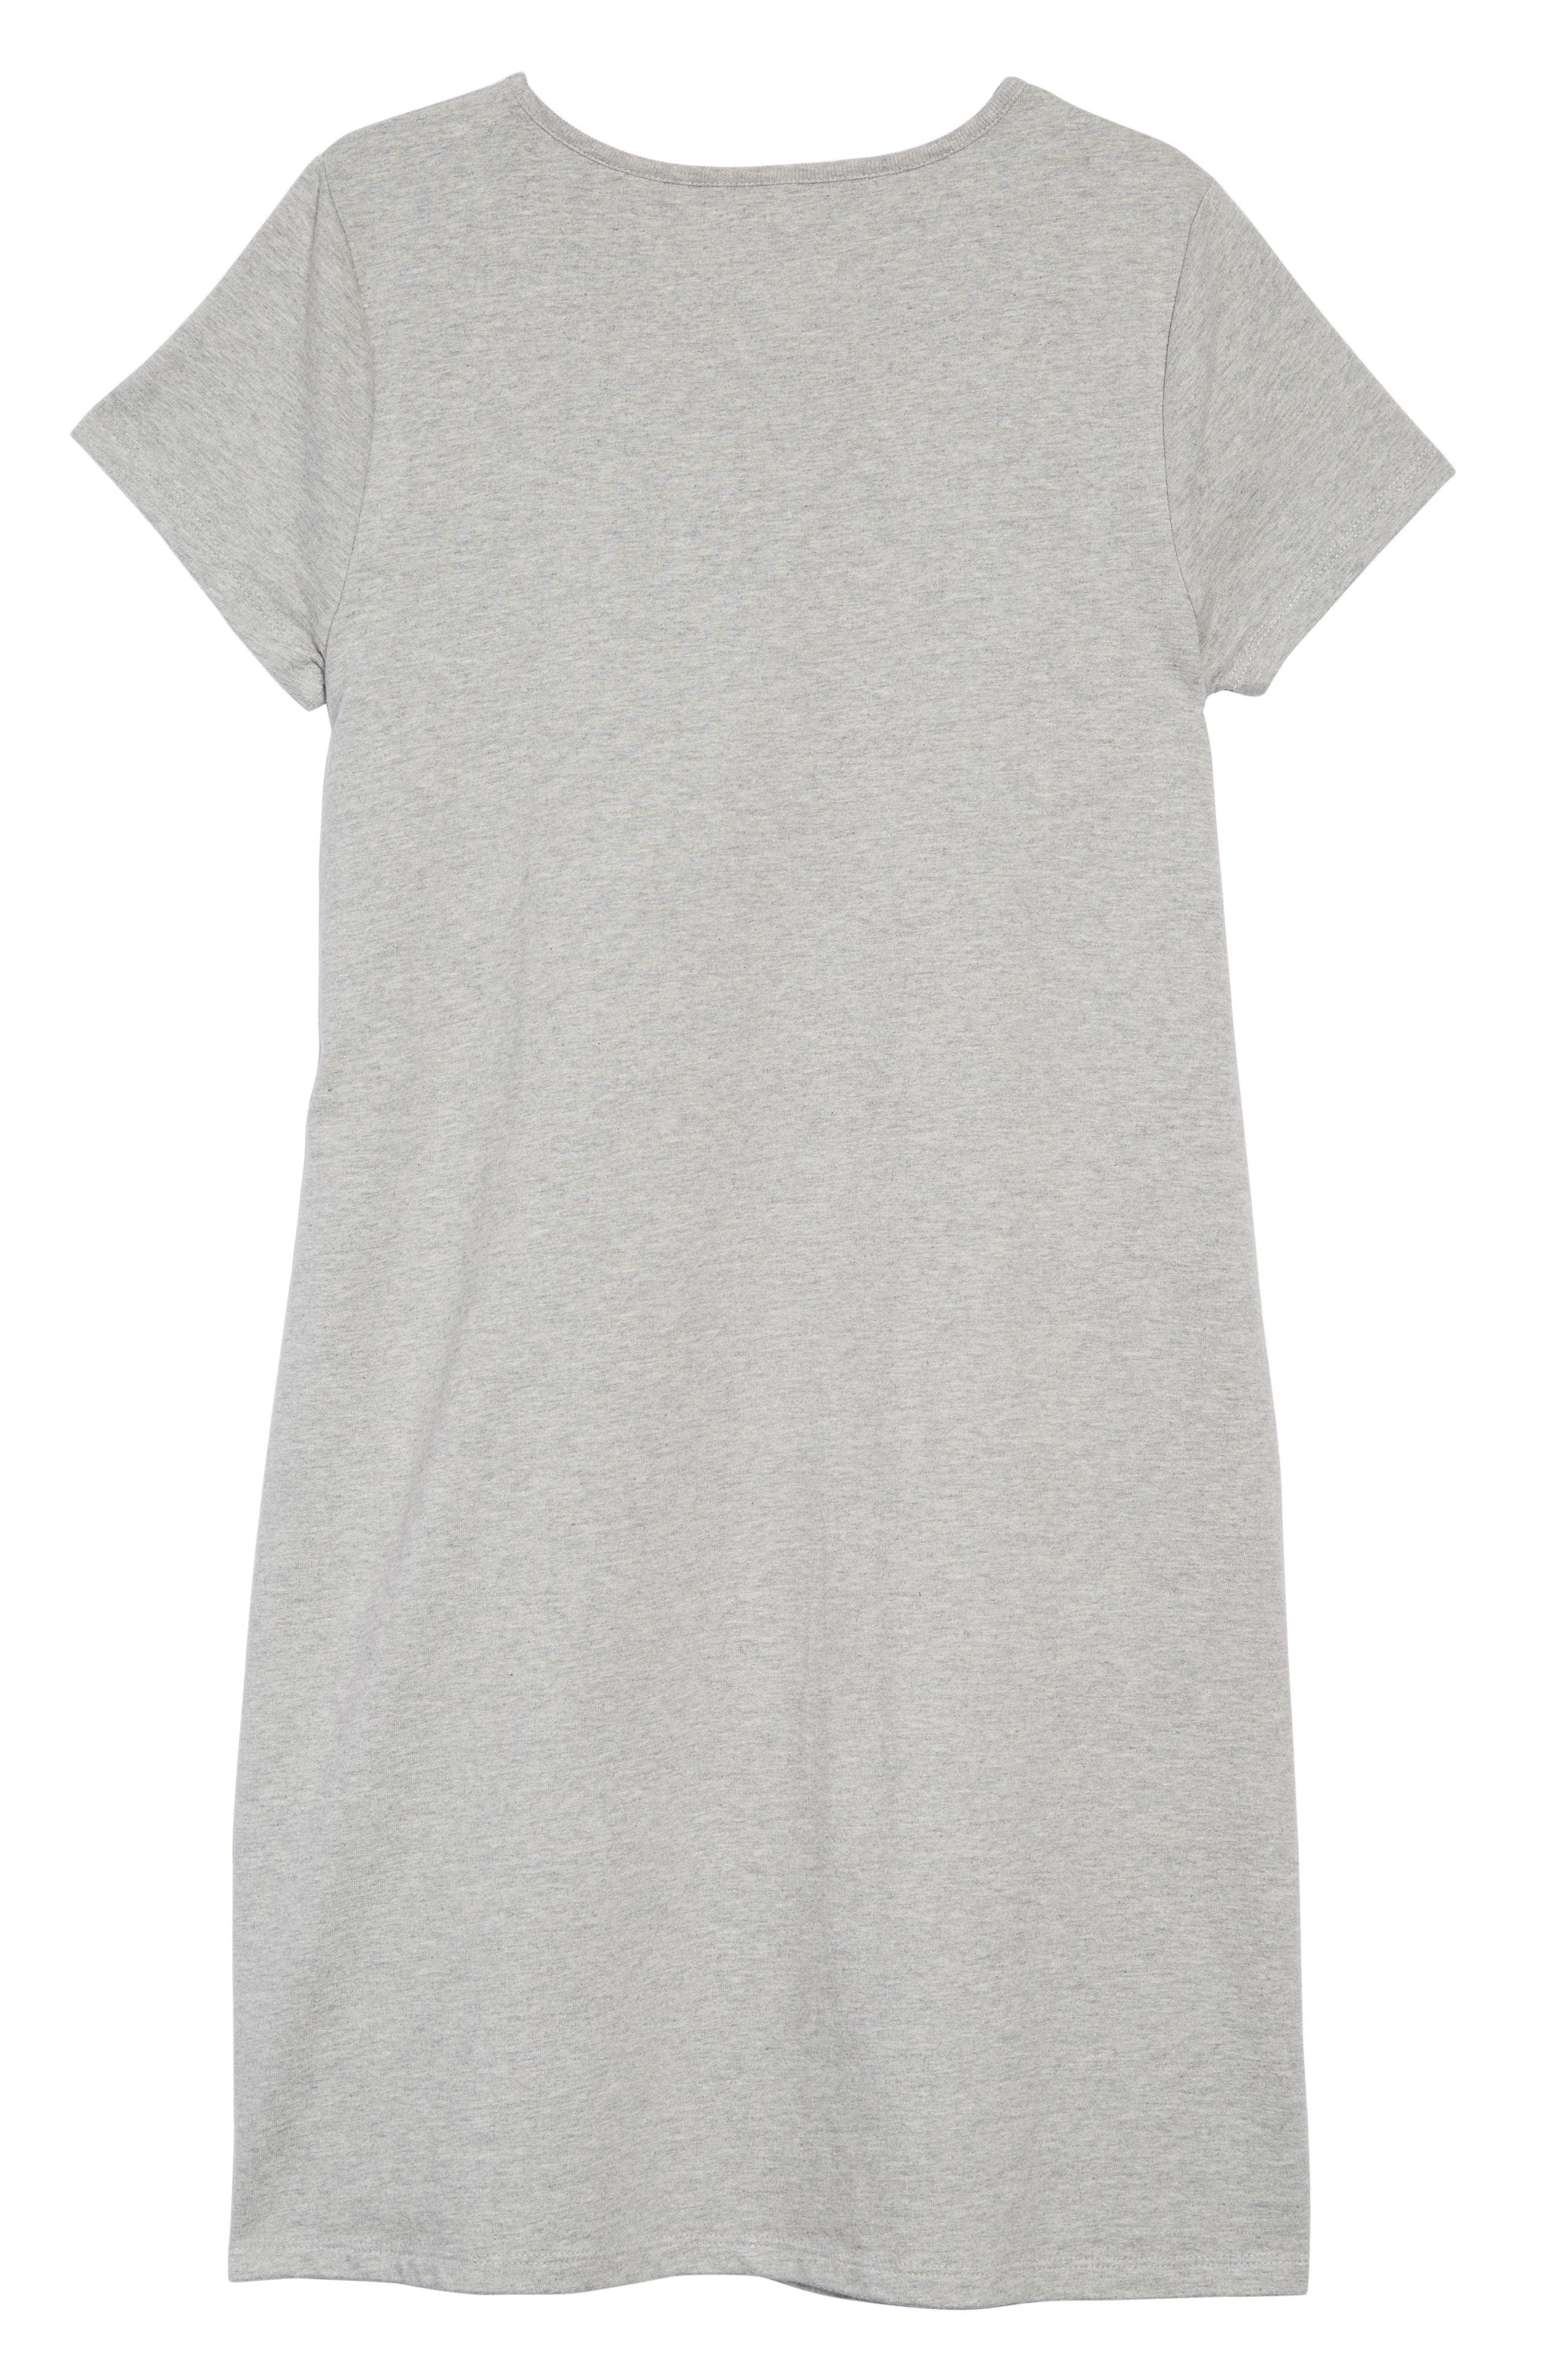 Shimmer Flip Sequin Star T-Shirt Dress,                             Alternate thumbnail 2, color,                             GRY GREY MARL/ RAINBOW SEQUINS